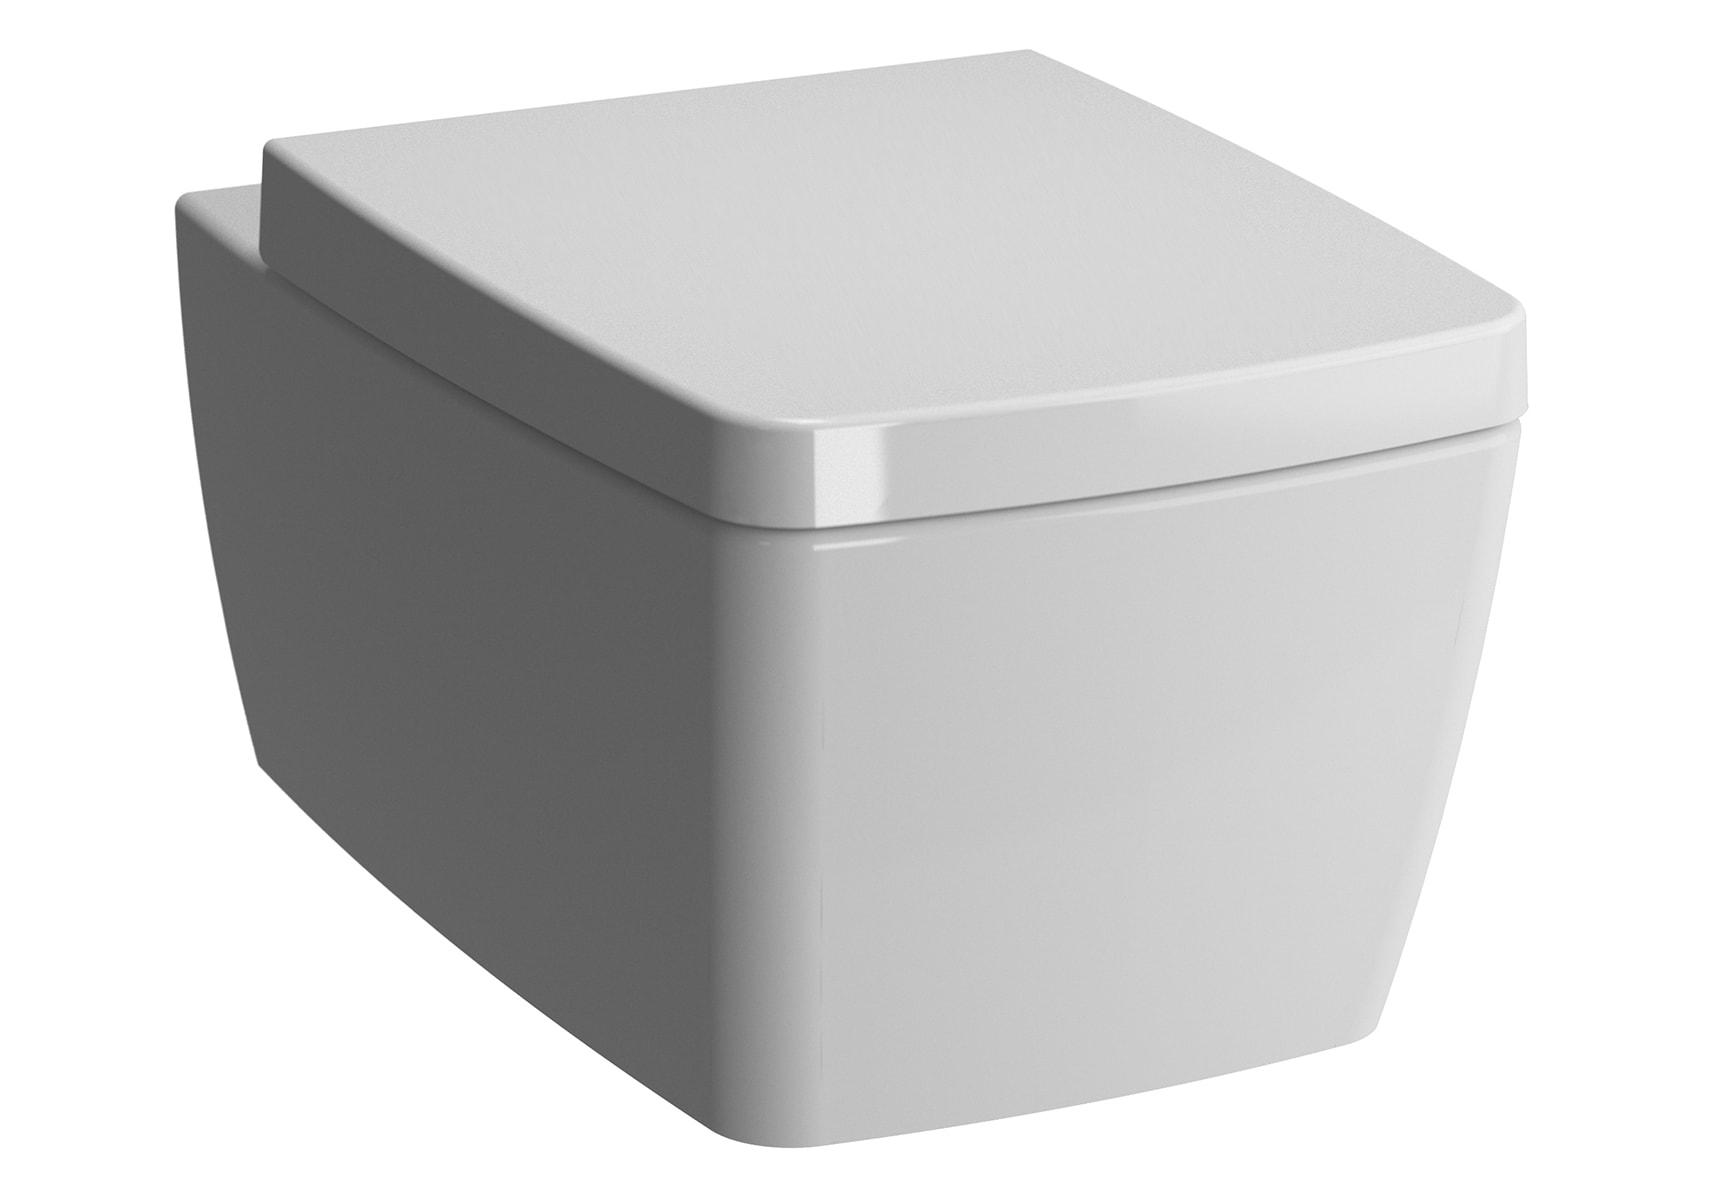 Metropole Rim-Ex Wall-Hung WC Pan, 56cm